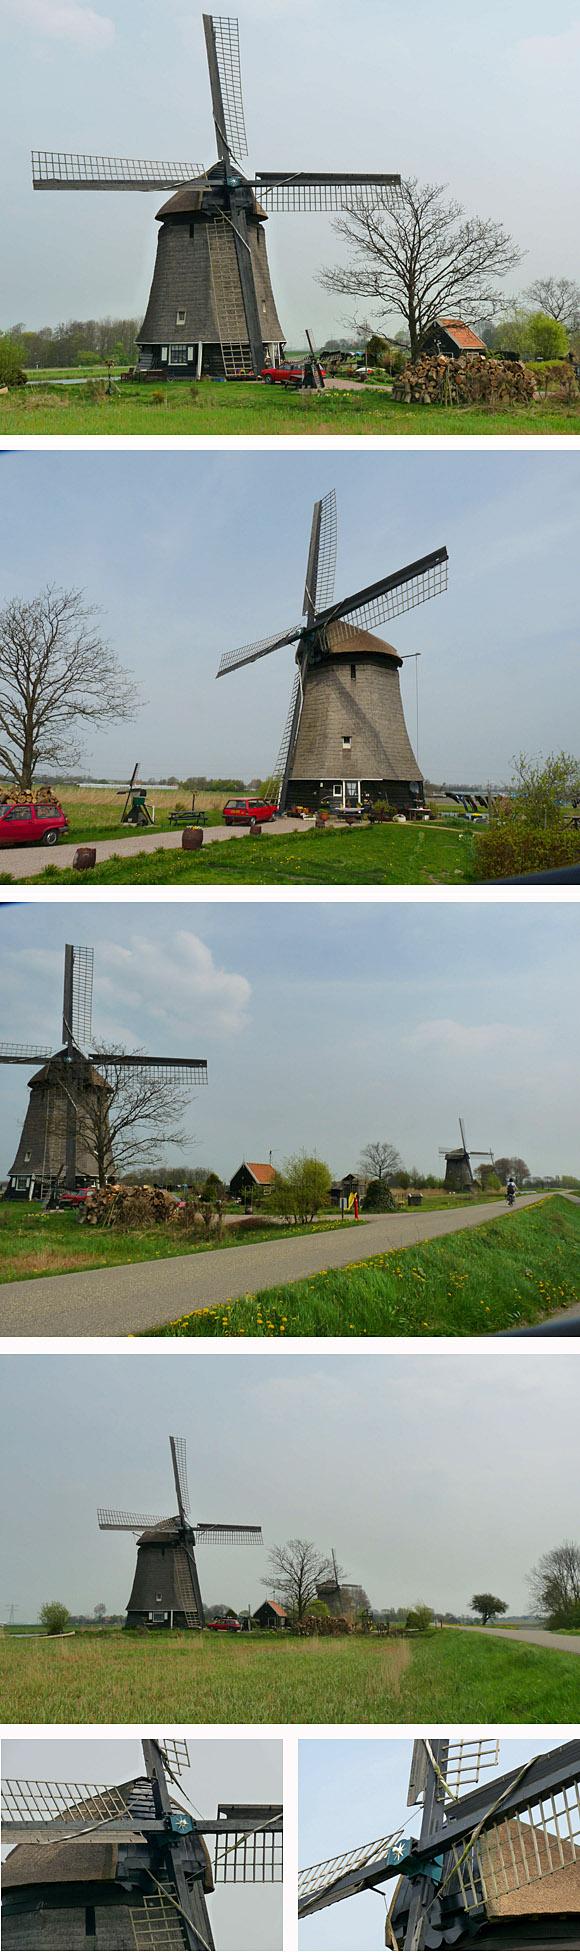 Strijkmolen L, Rustenburg, Foto's: Gerard Roomer (28-4-2010).